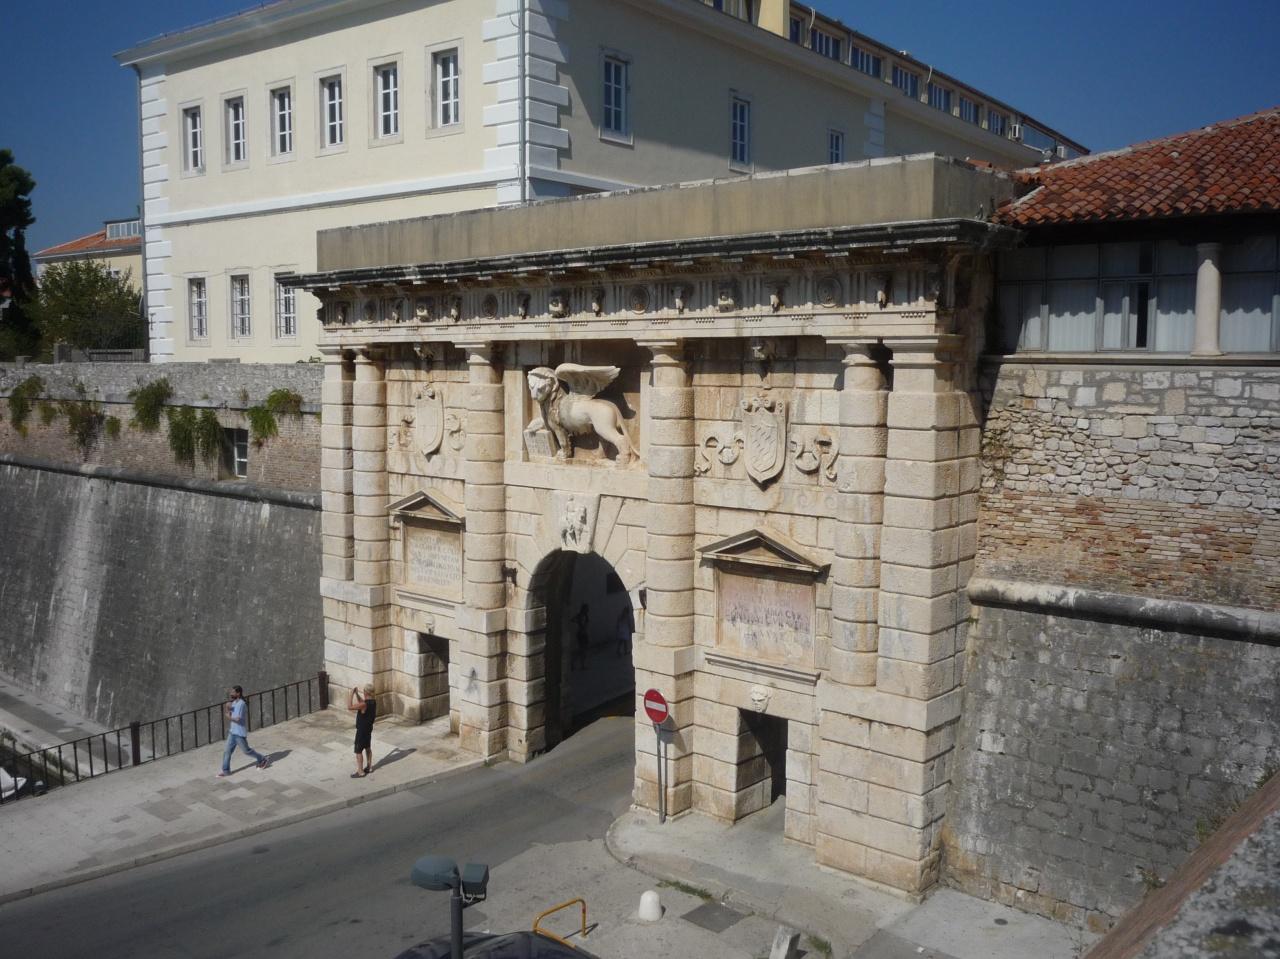 The City Walls and Gates of Zadar - Croatia Reviews